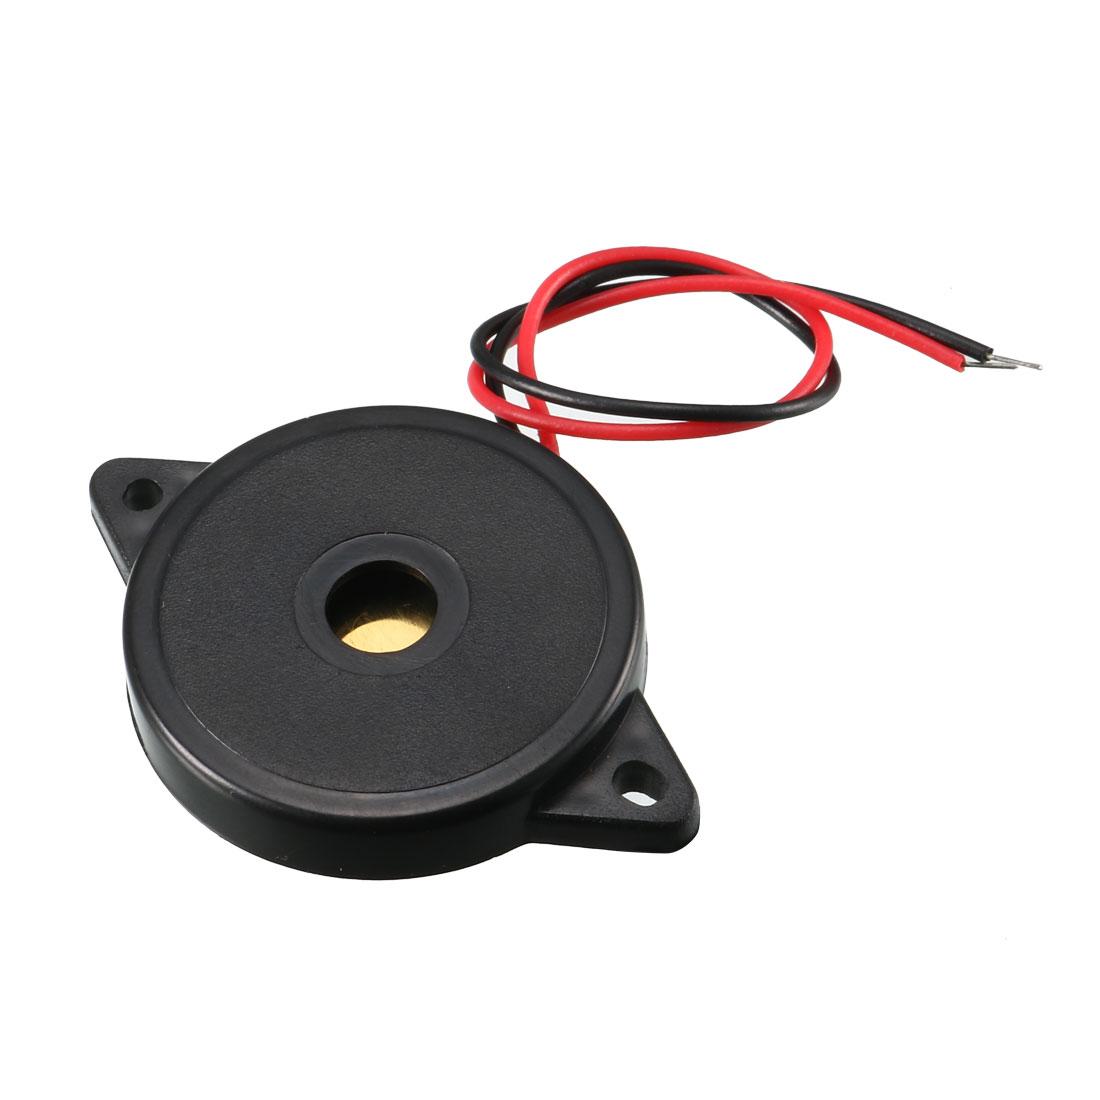 5 Pcs DC 1-30V 80dB Sound Electronic Buzzer Alarm Black 30 x 5mm